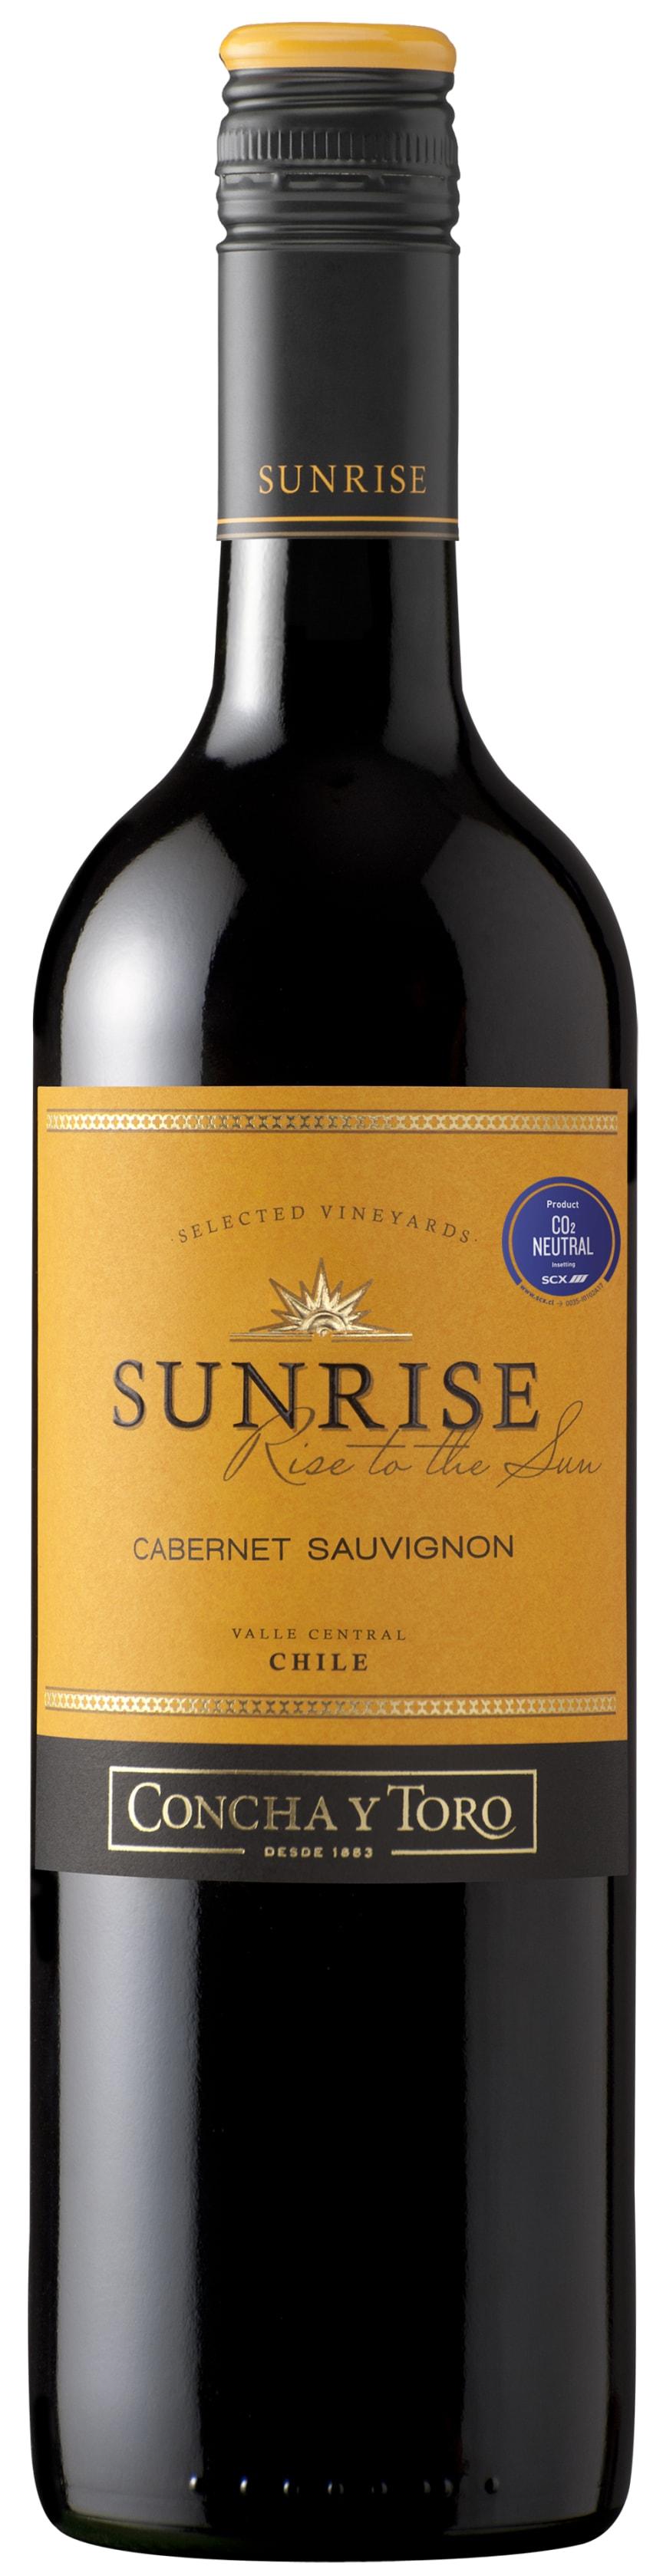 Sunrise Cabernet Sauvignon (nr 16676)